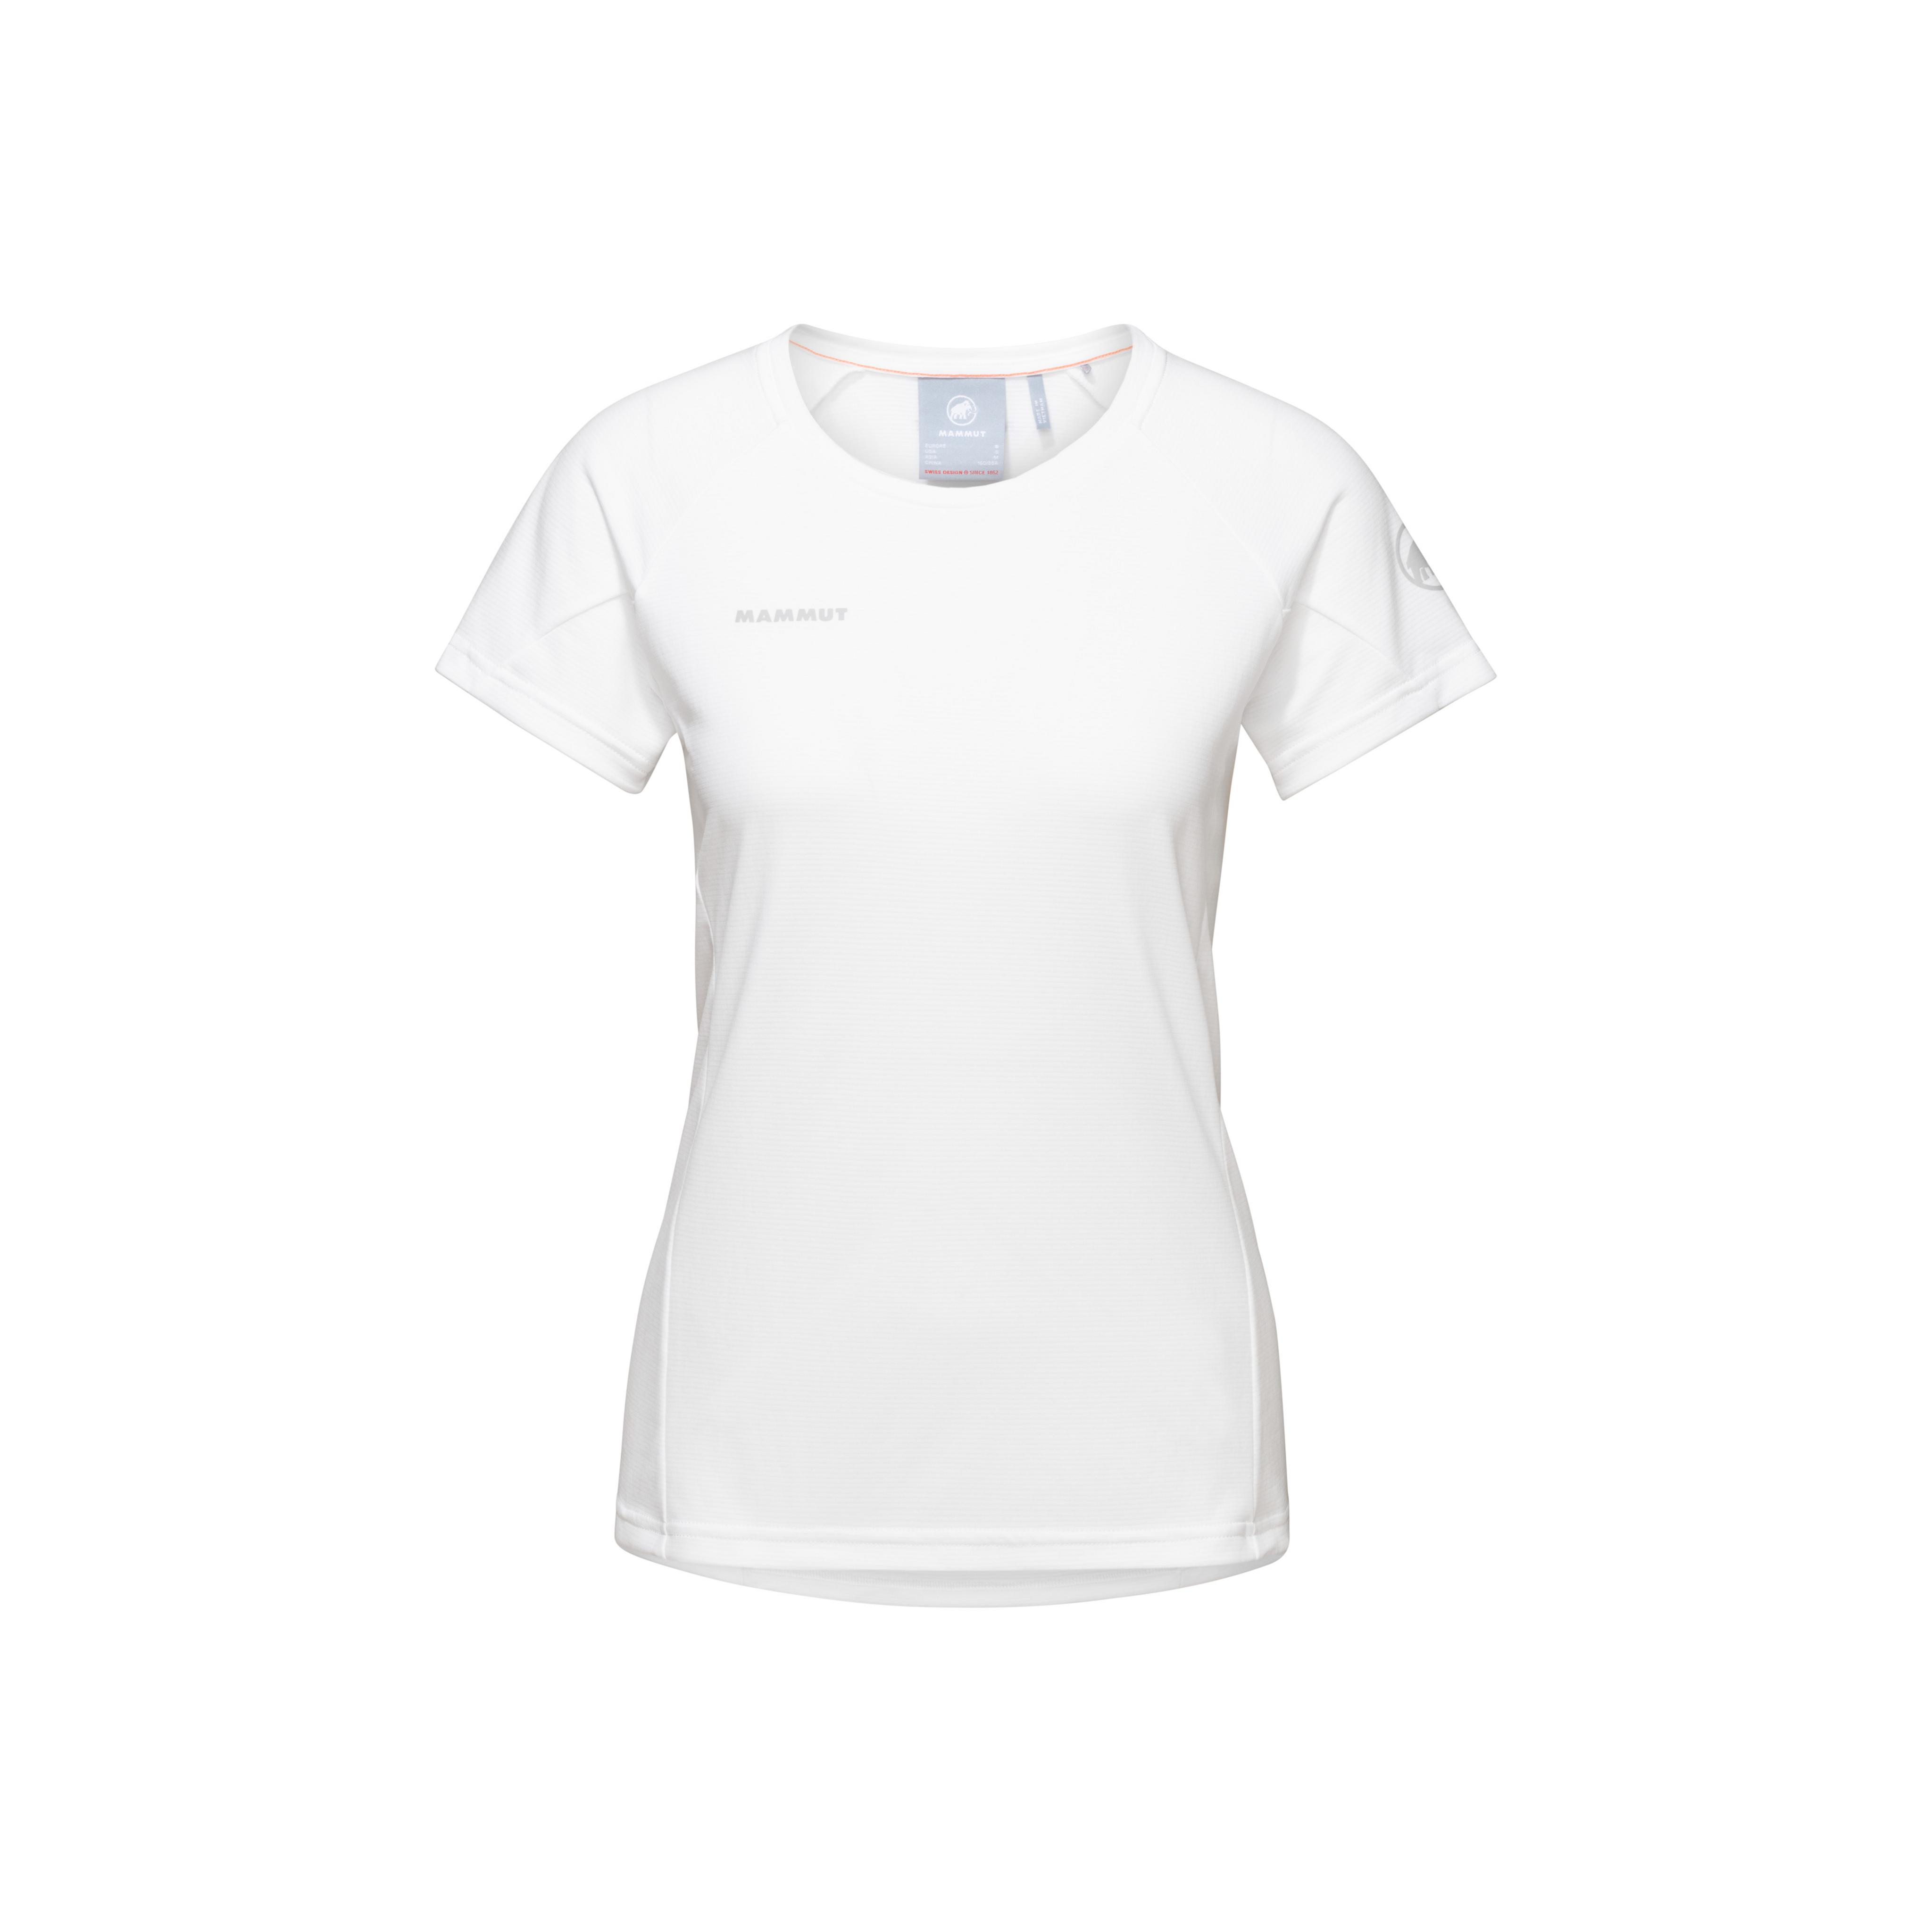 Aegility T-Shirt Women - white, XS thumbnail